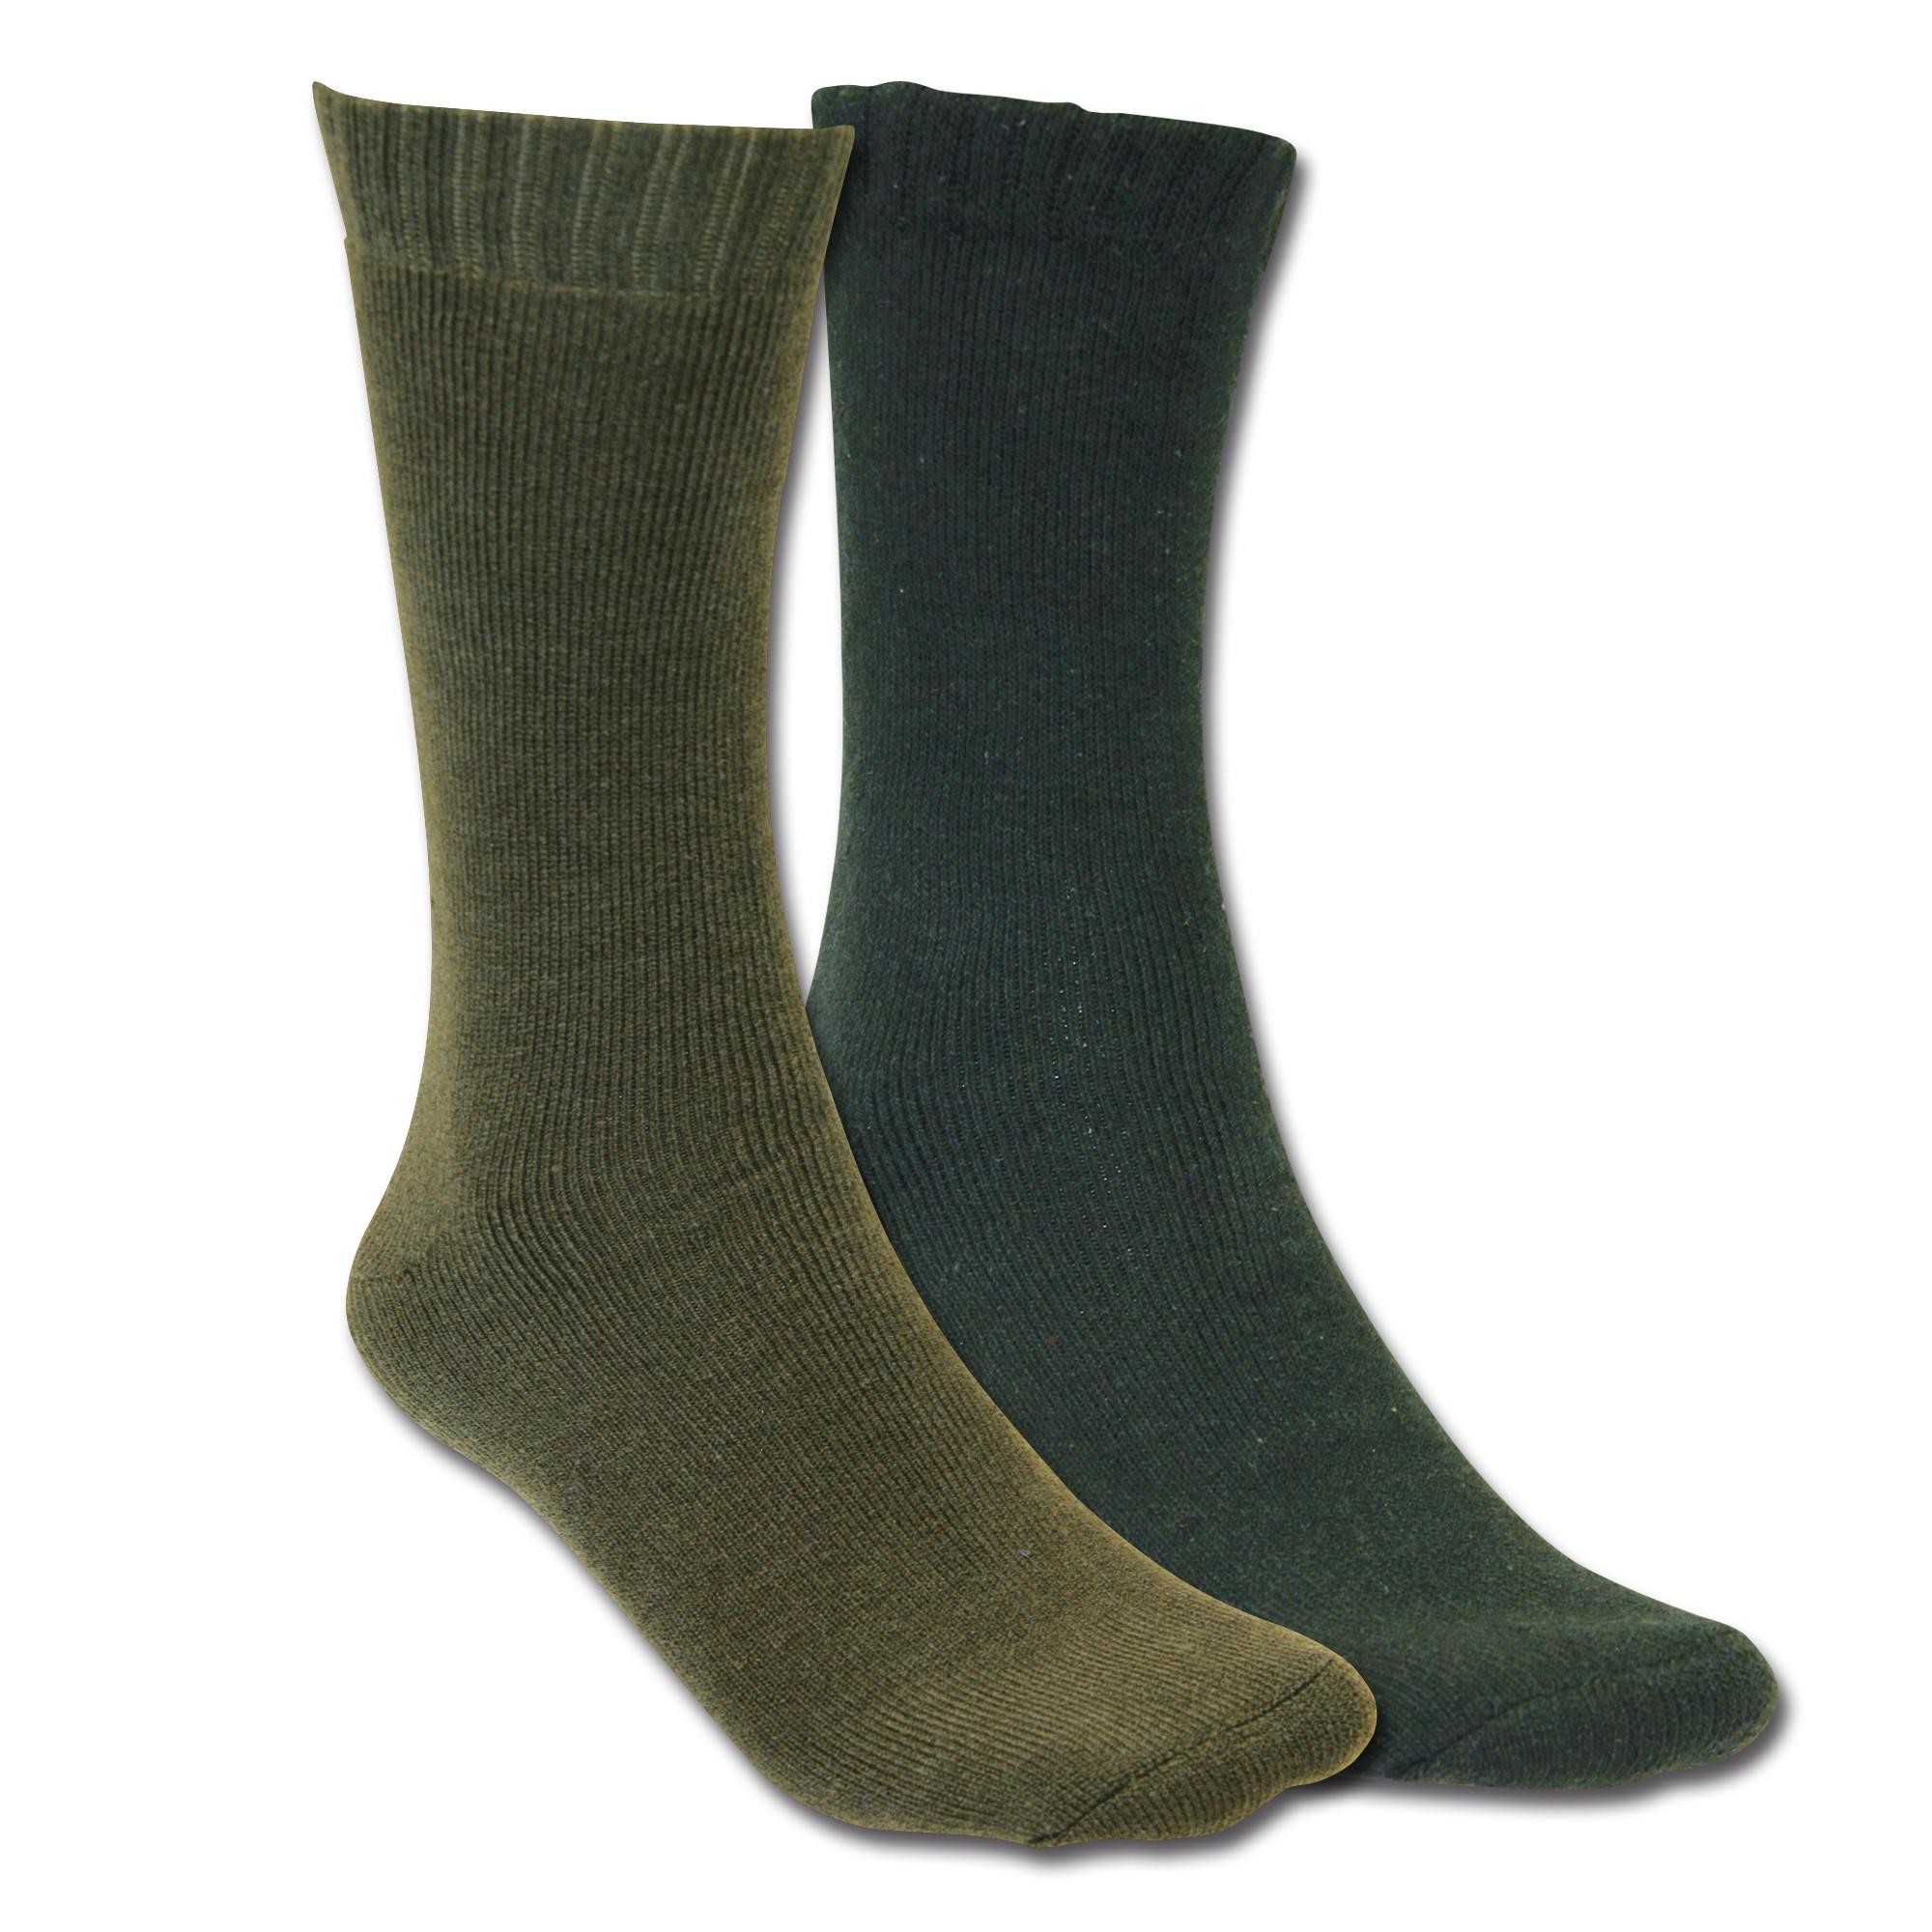 Thermal Socks MMB olive green/black